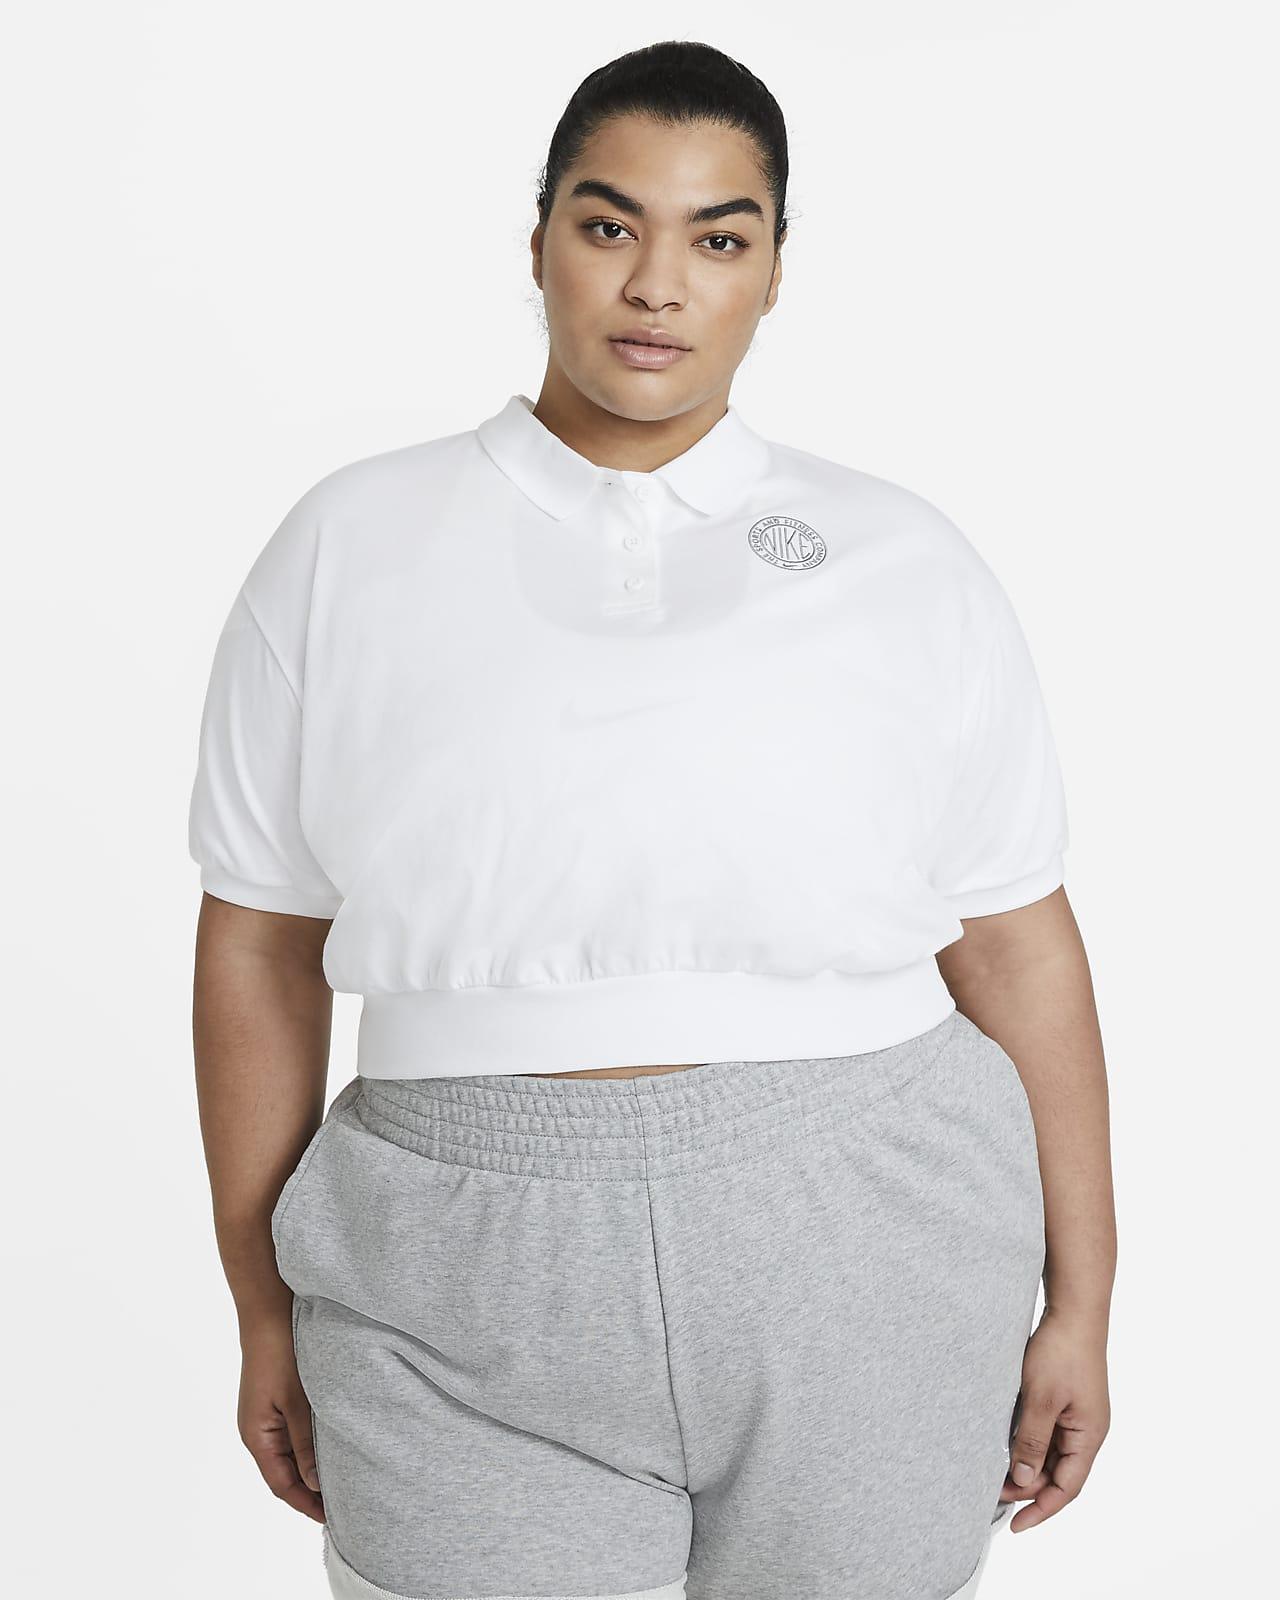 Prenda para la parte superior corta para mujer talla grande Nike Sportswear Femme